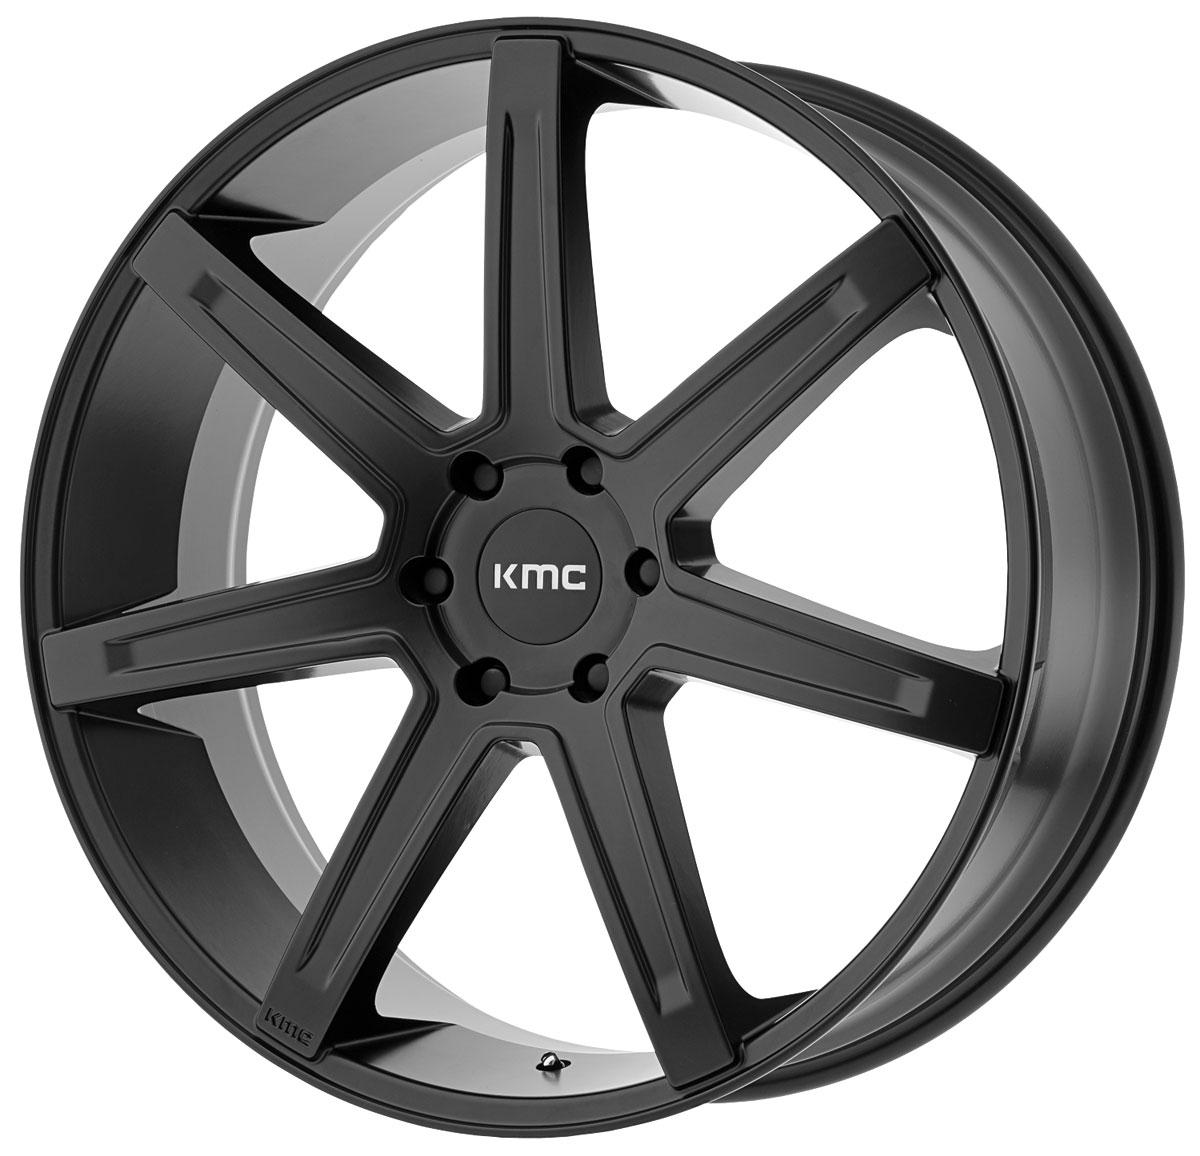 Wheel, KMC, KM700 Revert, 1999-2019 Escalade, 20X9